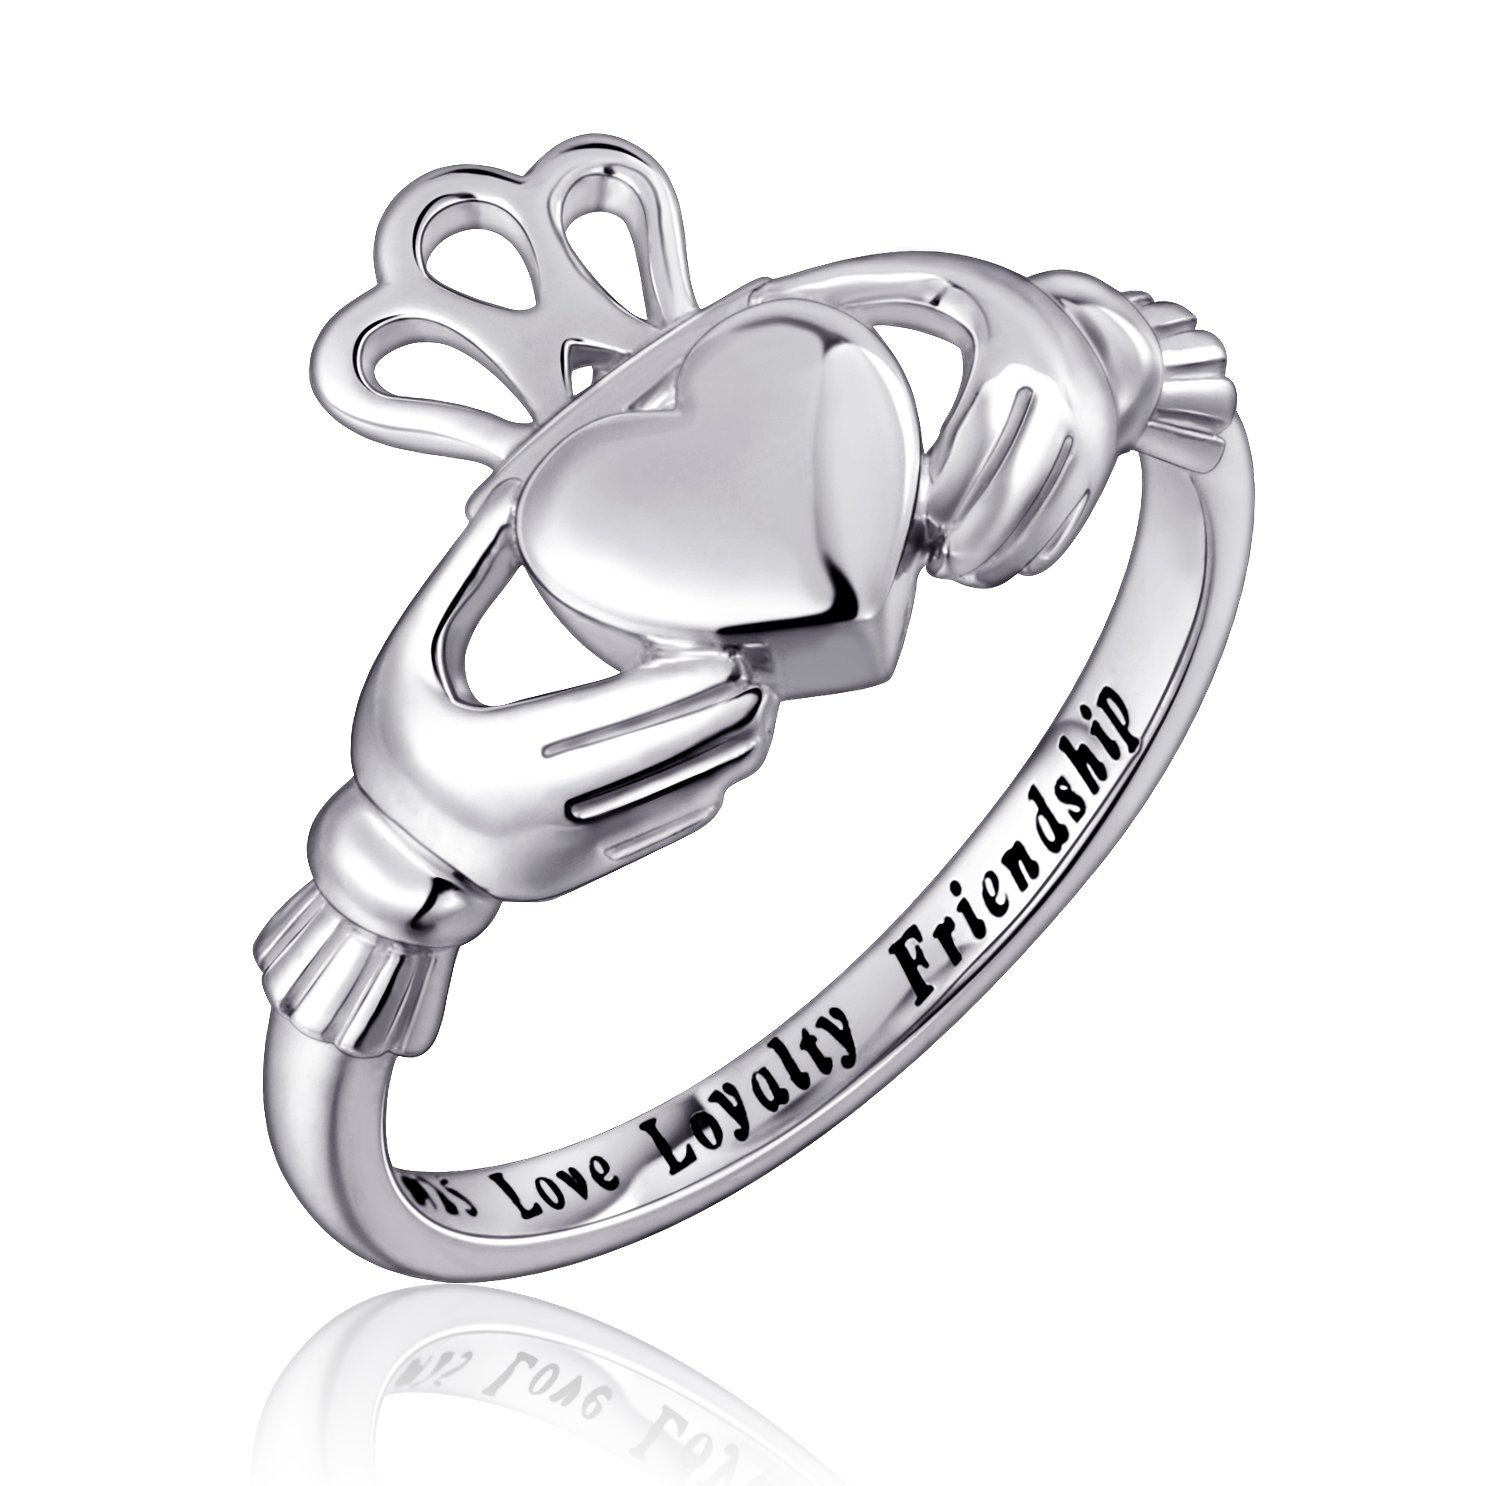 925 Sterling Silver Love Loyalty Friendship Irish Ladies' Claddagh Ring, Size 6